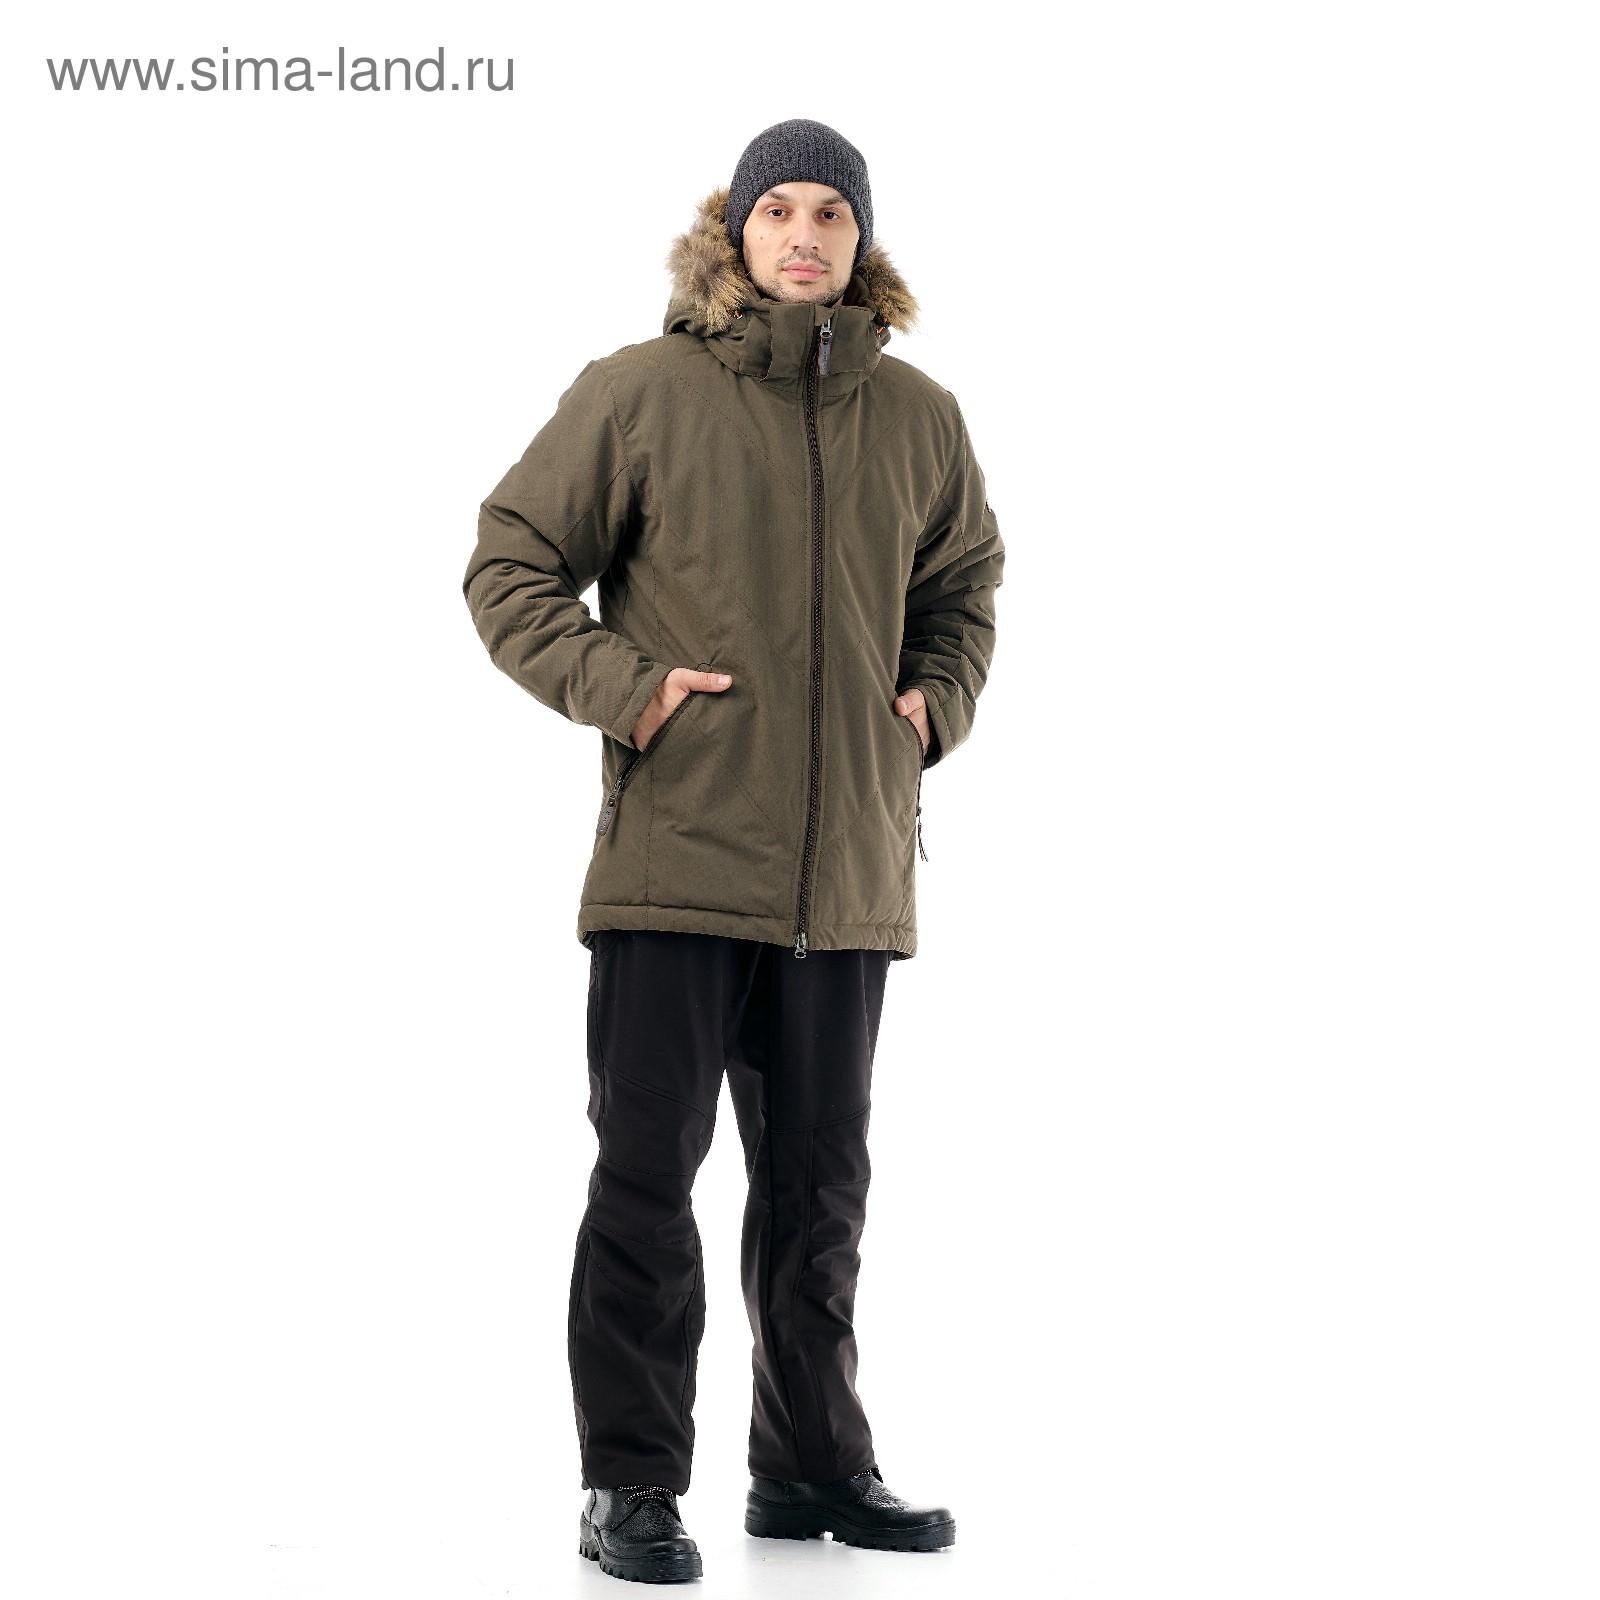 Куртка PRIDE «Ангара», норвегия, размер 44-46, рост 170-176, цвет ... 69a89ddaa25